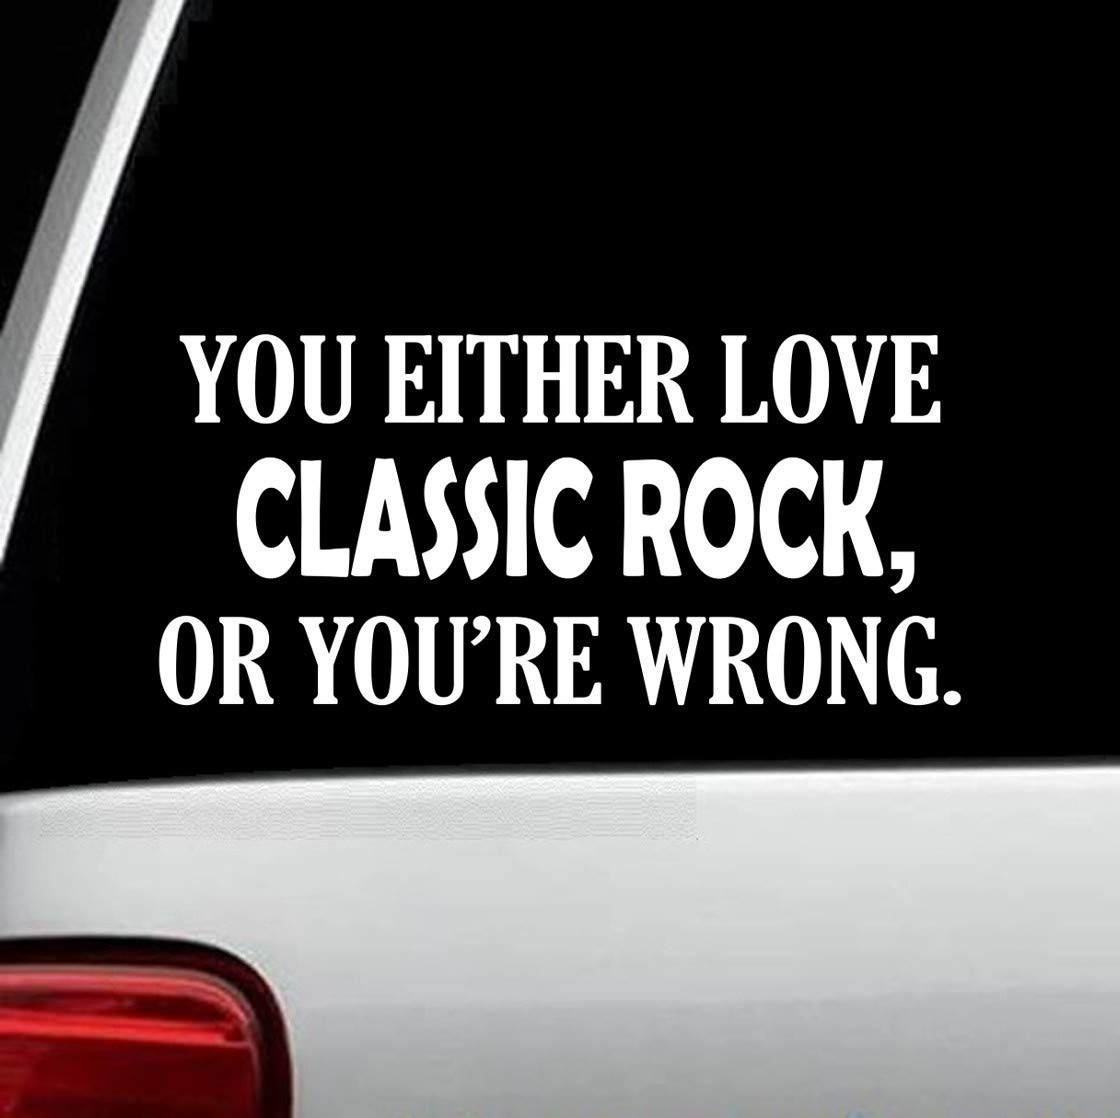 Classic Rock Funny Decal Sticker for Car Window 8.0 Inch BG 255